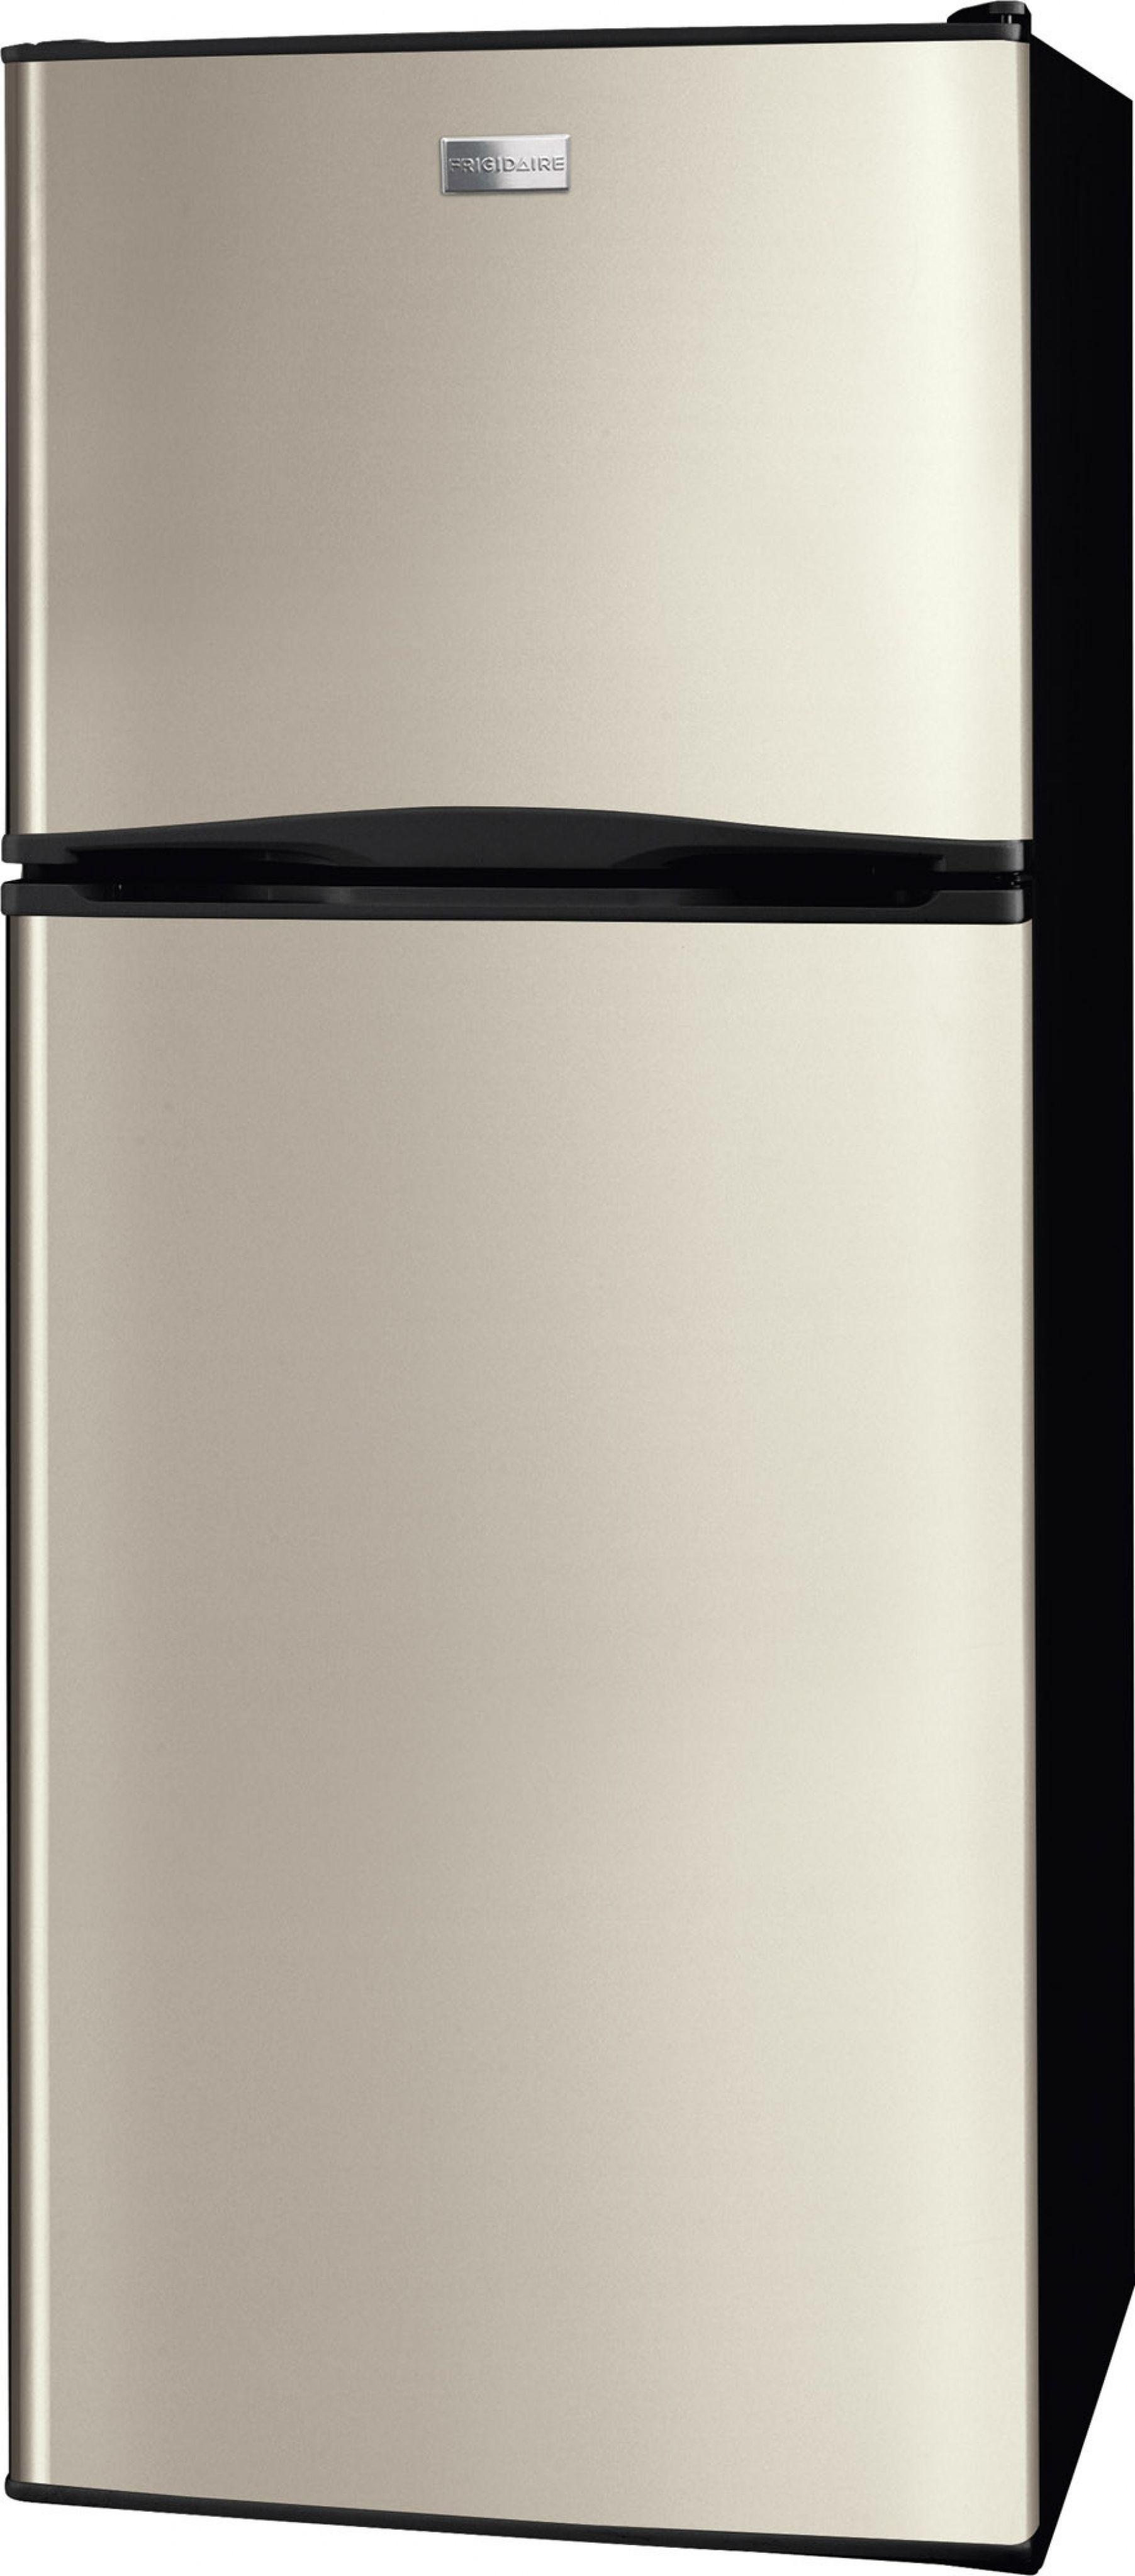 Apartment Sized Refrigerators - favorite interior paint colors ...